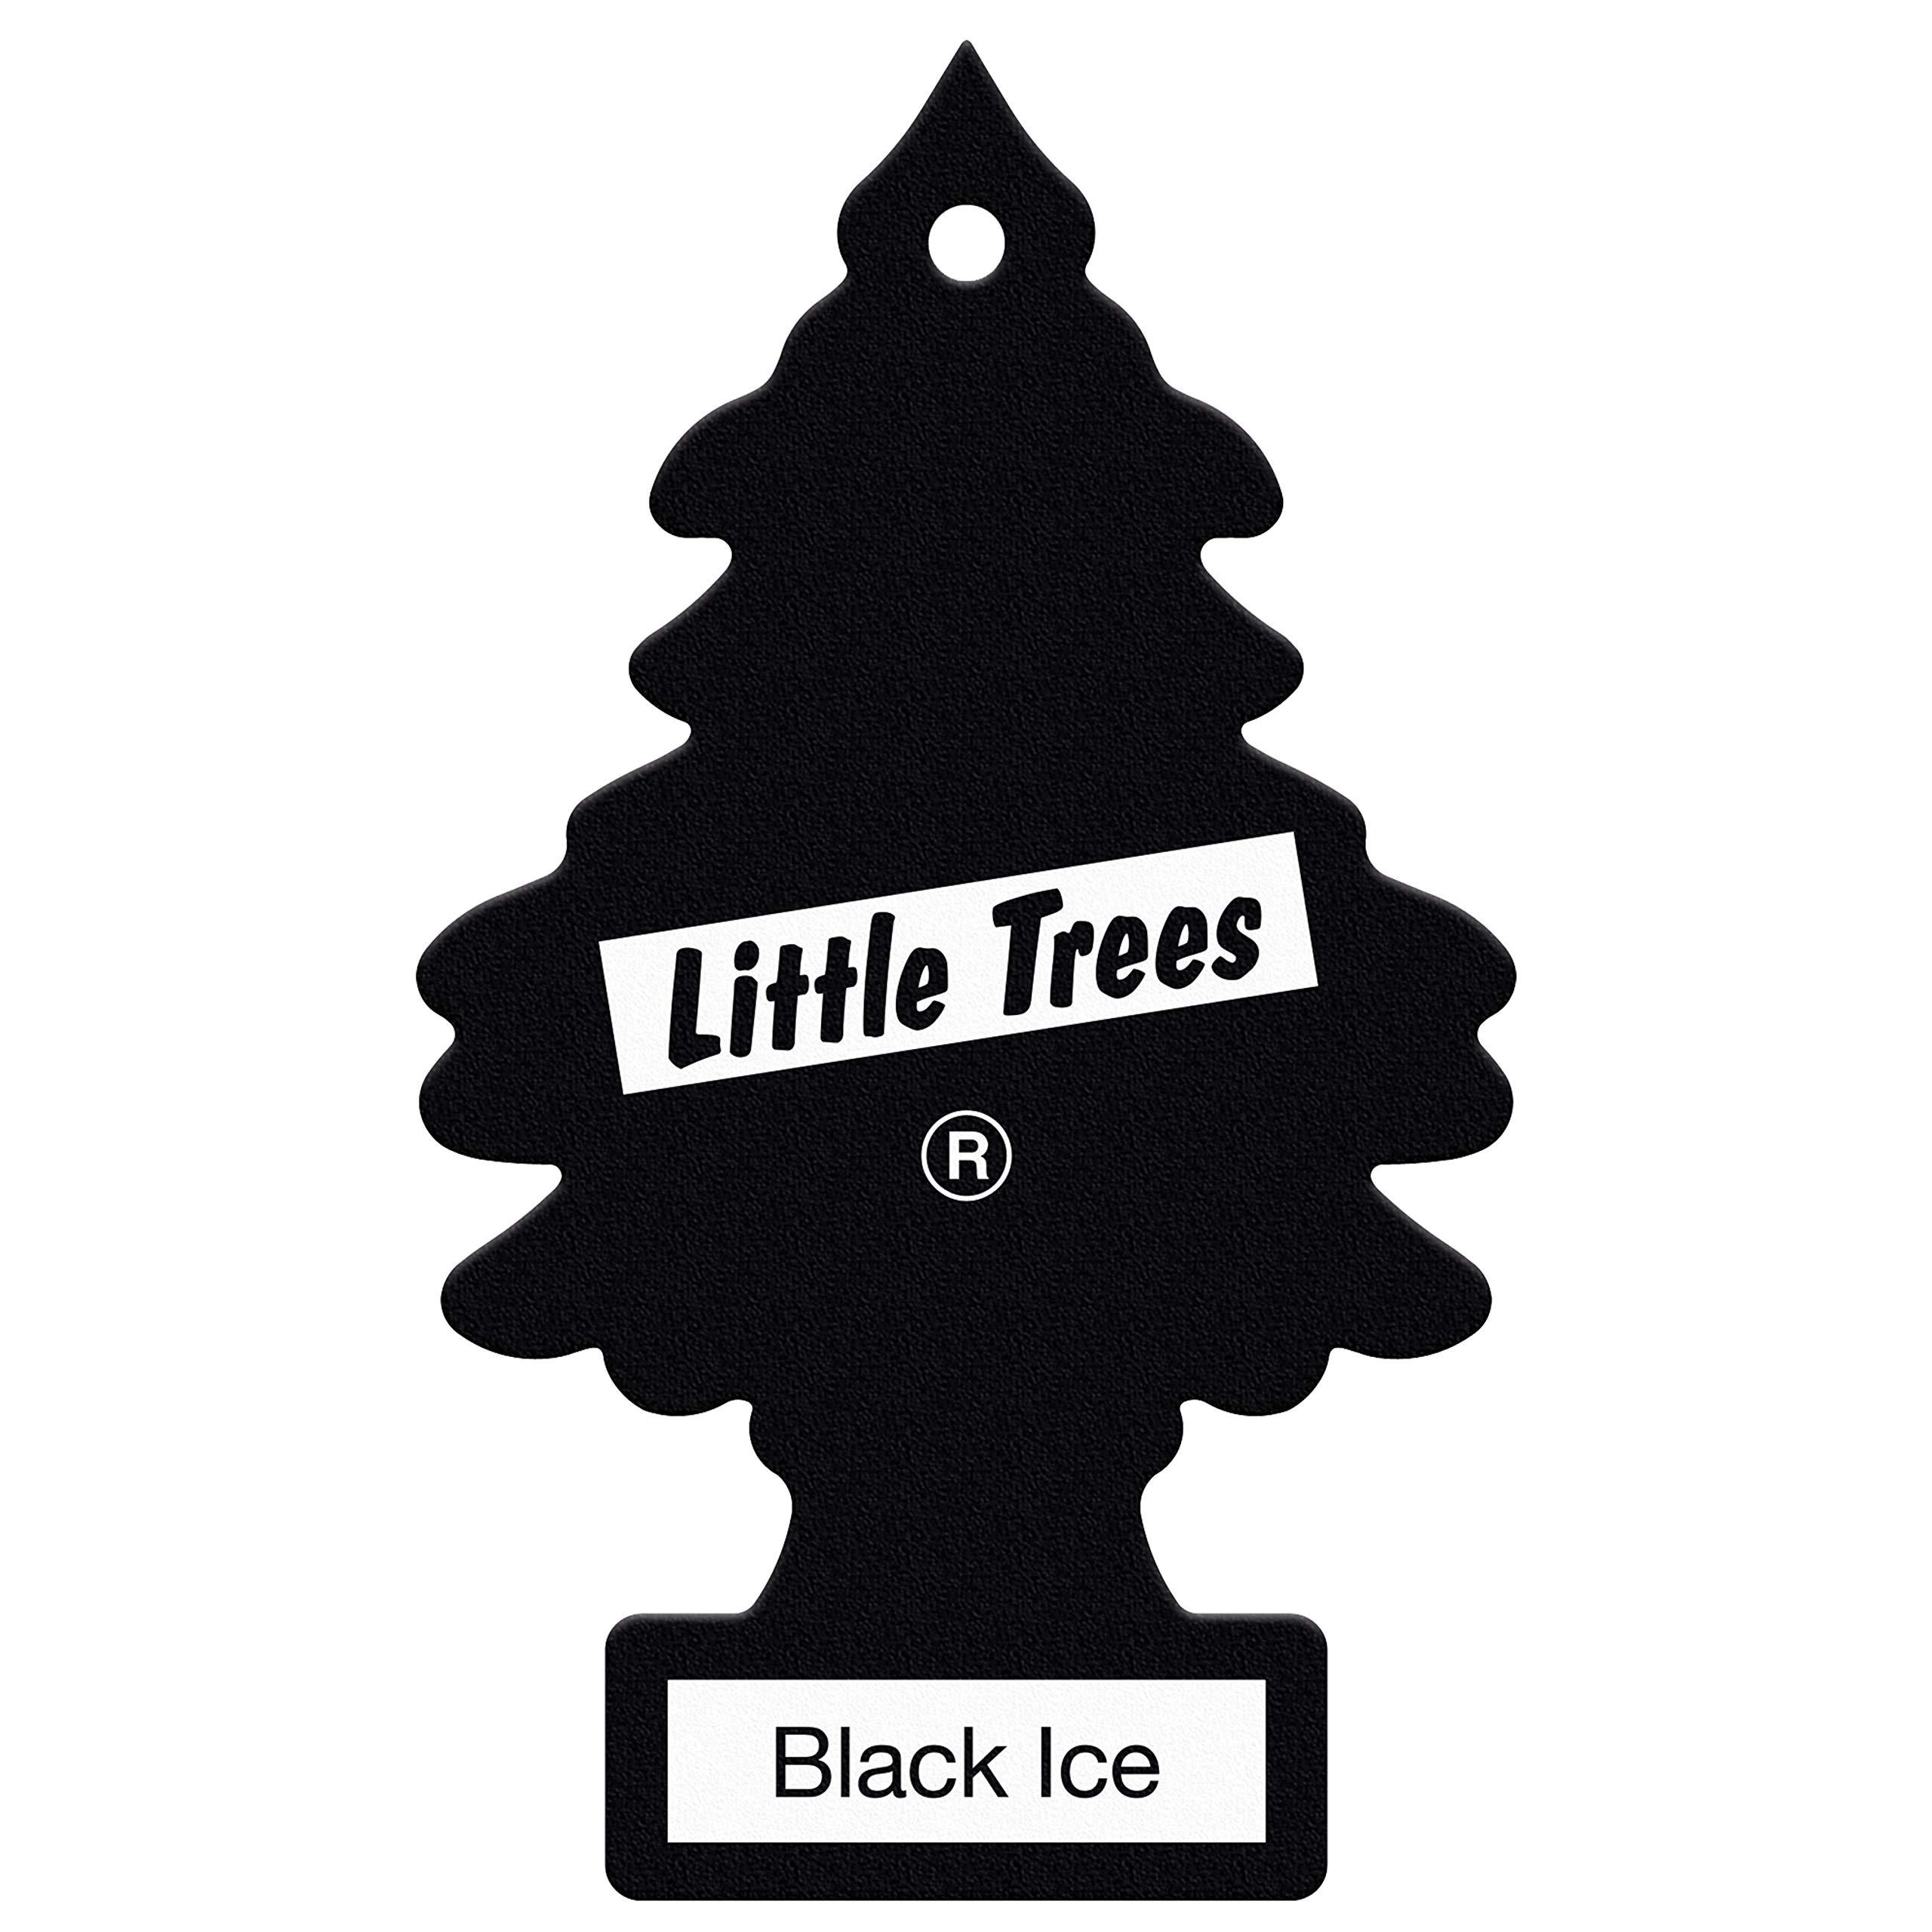 LITTLE TREES Air Freshener Black Ice Fragrance MTR0004- for Car Home - 1 Unit